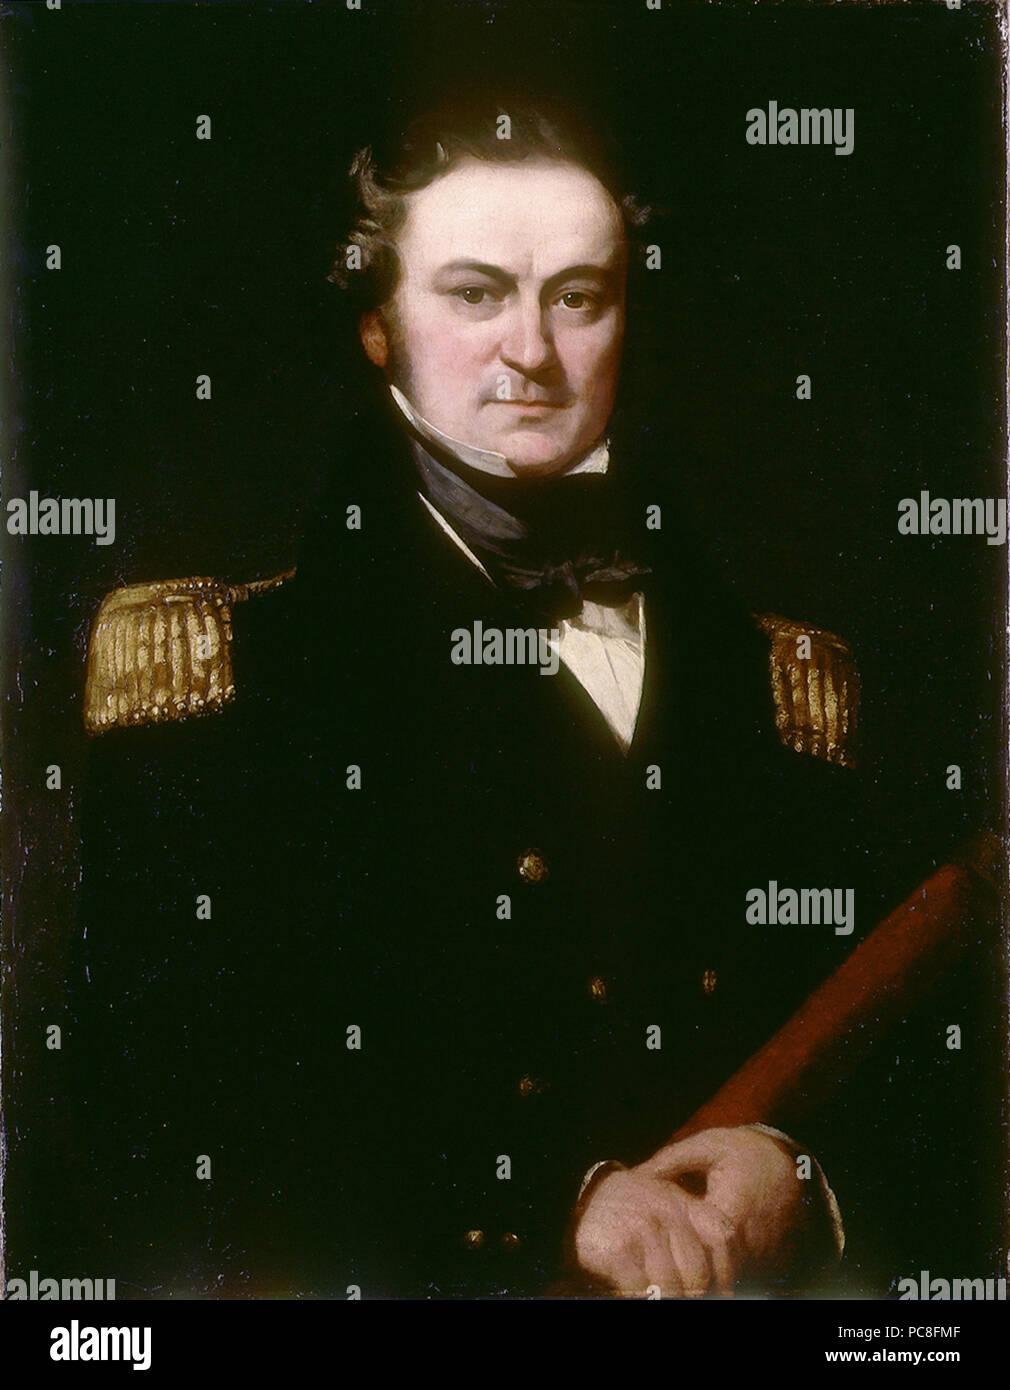 Il capitano William Edward Parry (1790-1855) *olio su tela *91,4 x 71,1 cm *ca 1830 111 Capitano William Edward Parry (1790-1855), da Charles Skottowe Foto Stock